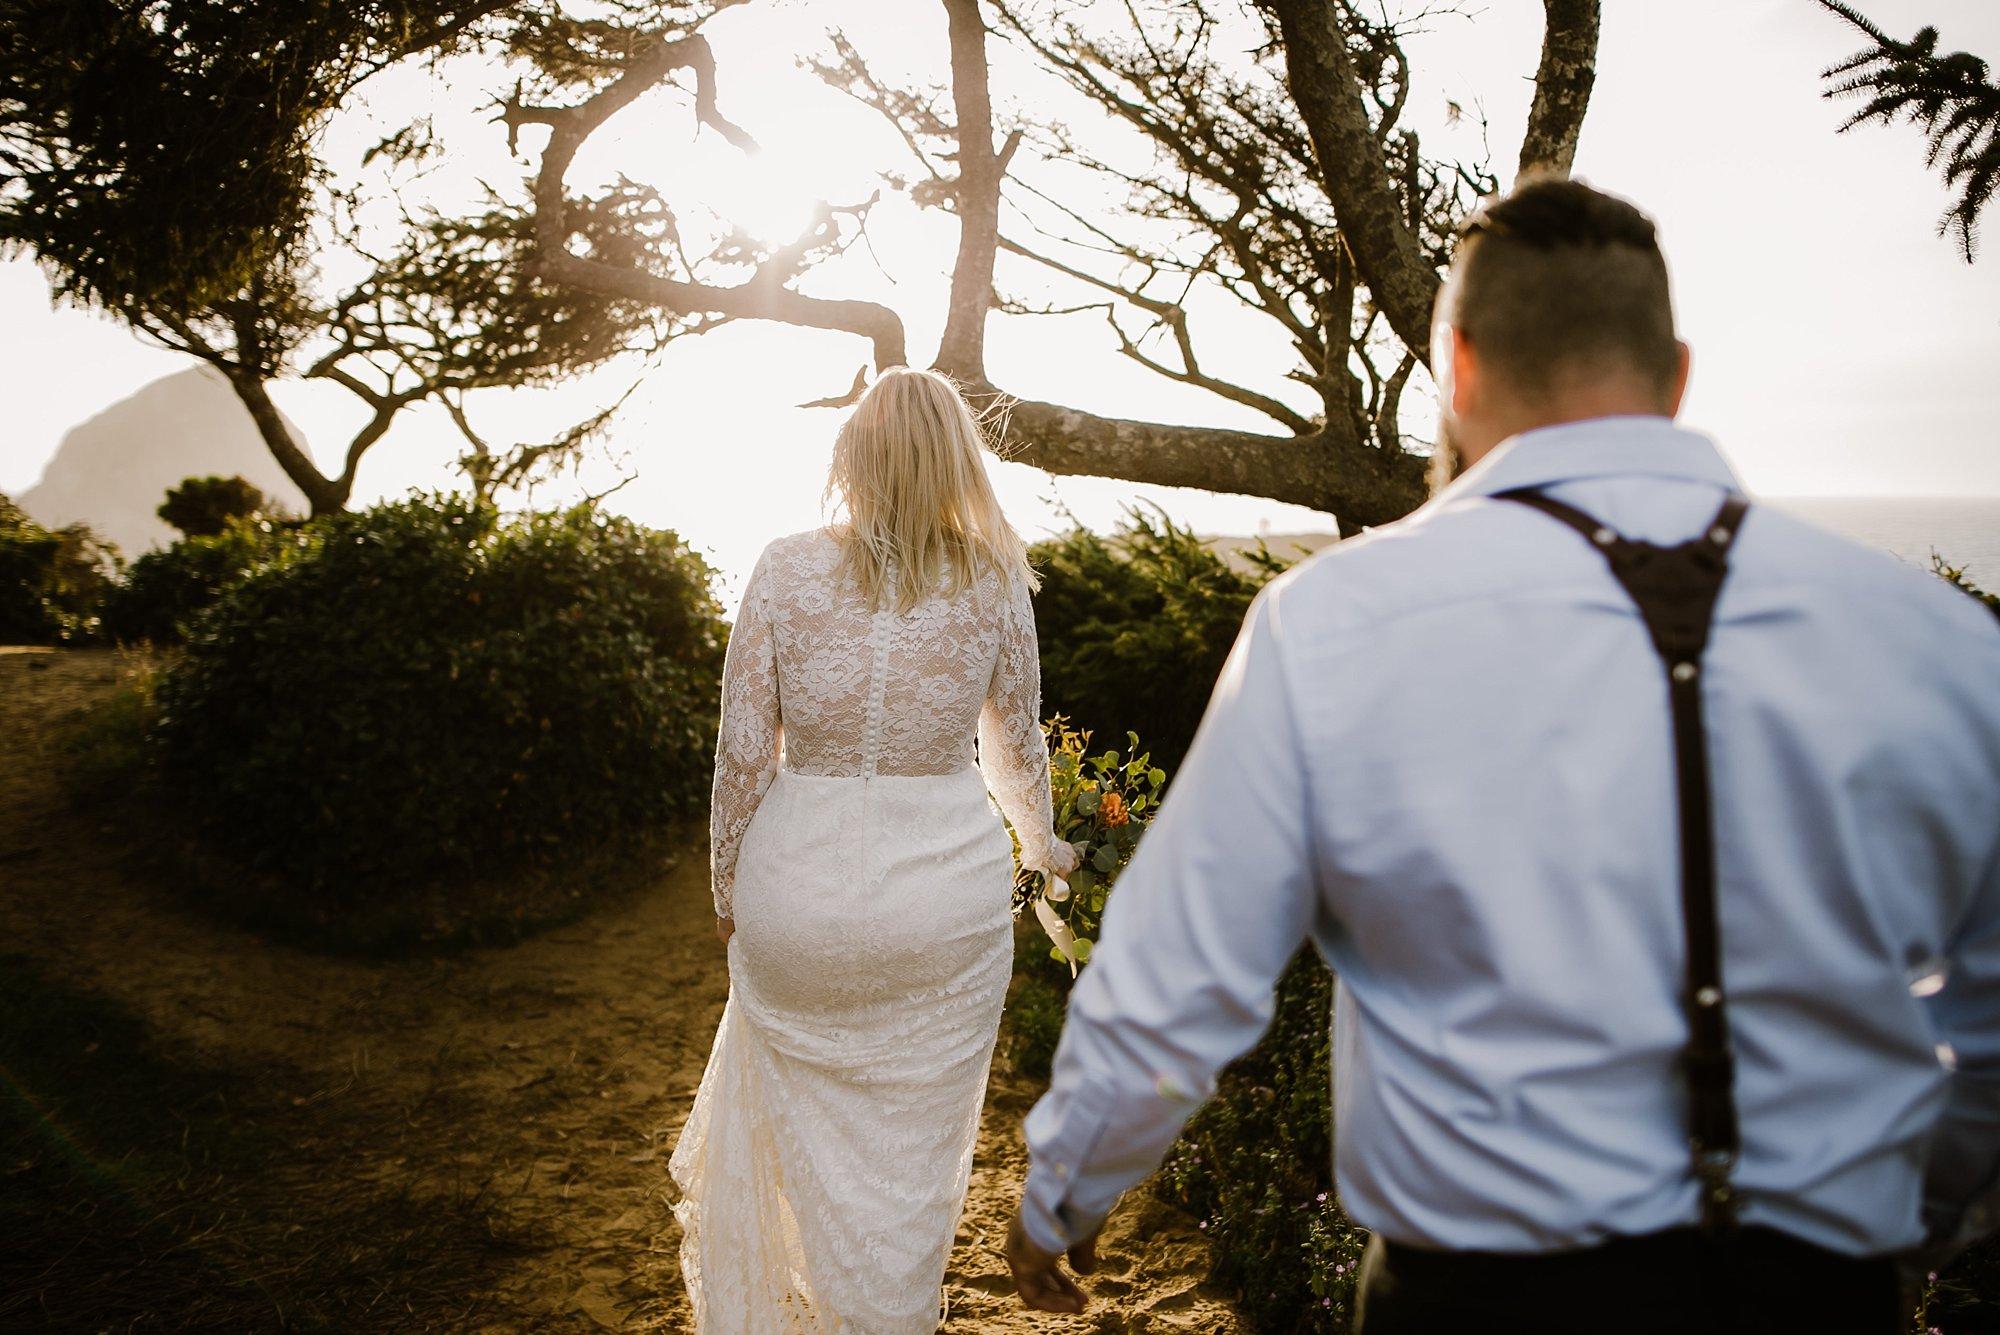 cape-kiwanda-elopement-wedding_0027.jpg